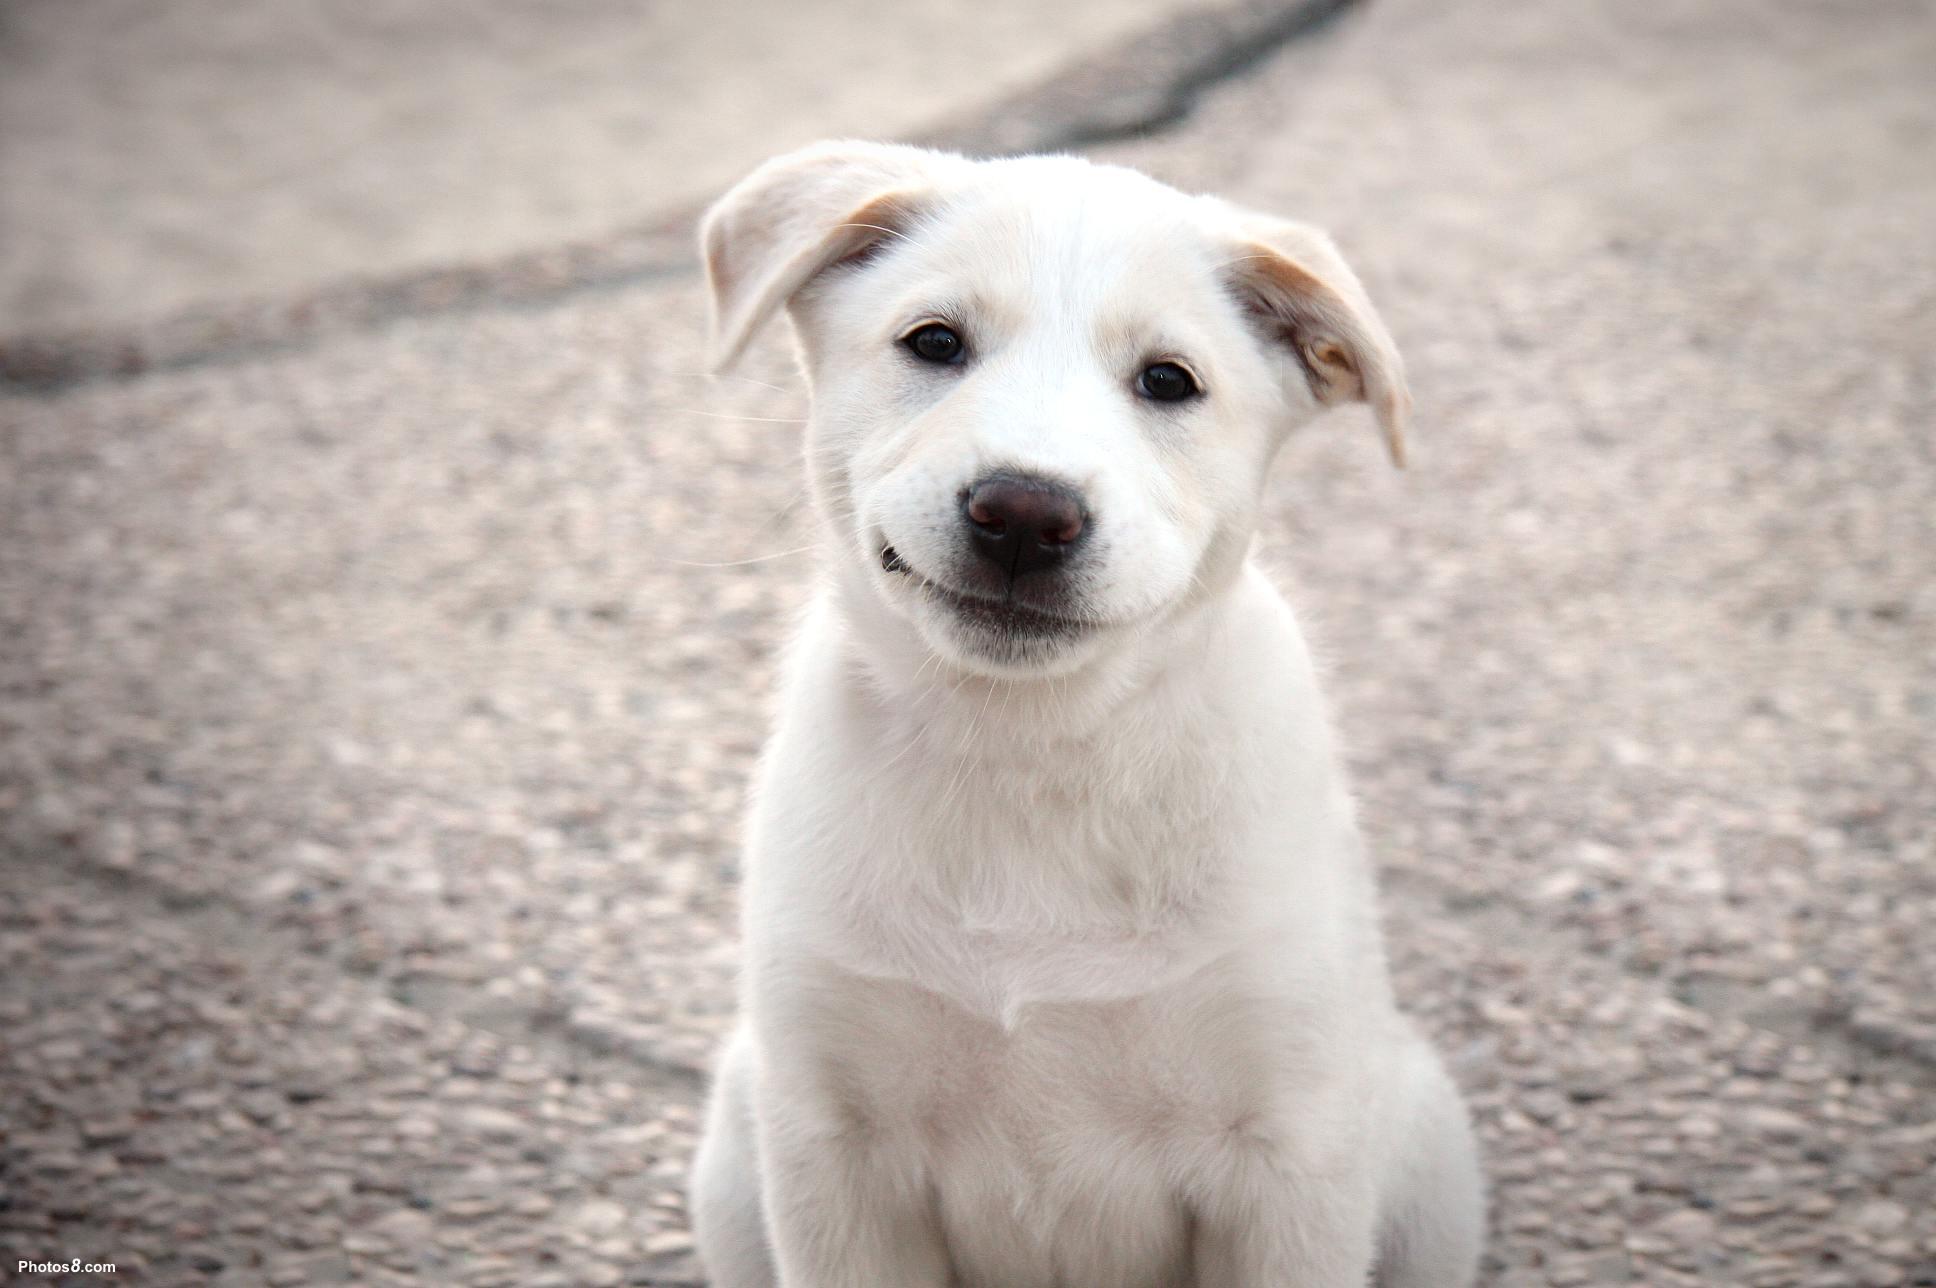 dog photos free download - hd desktop wallpapers | 4k hd